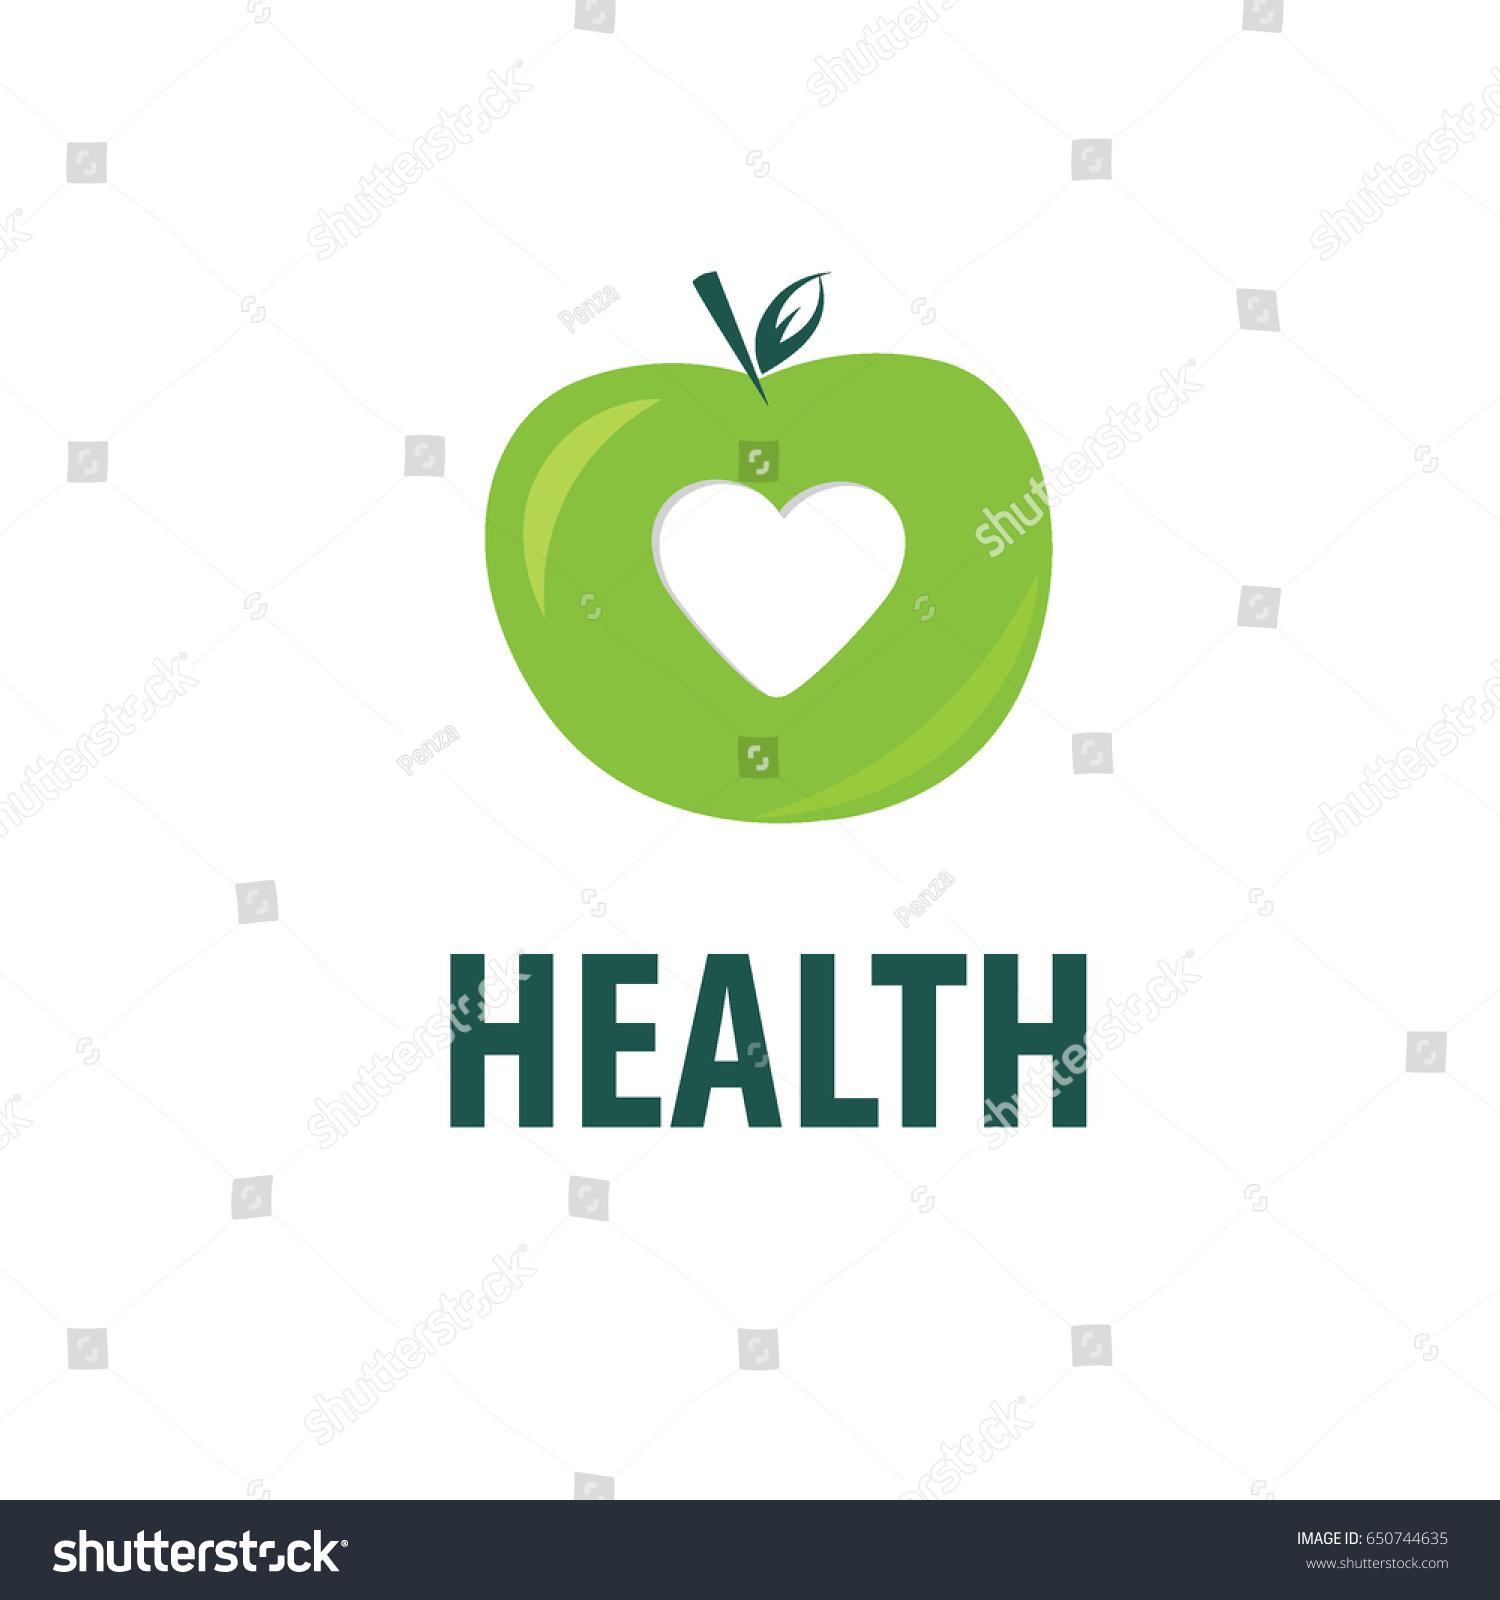 Vector Green Apple Logo Isolated Creative Stock Vector 650744635 ...